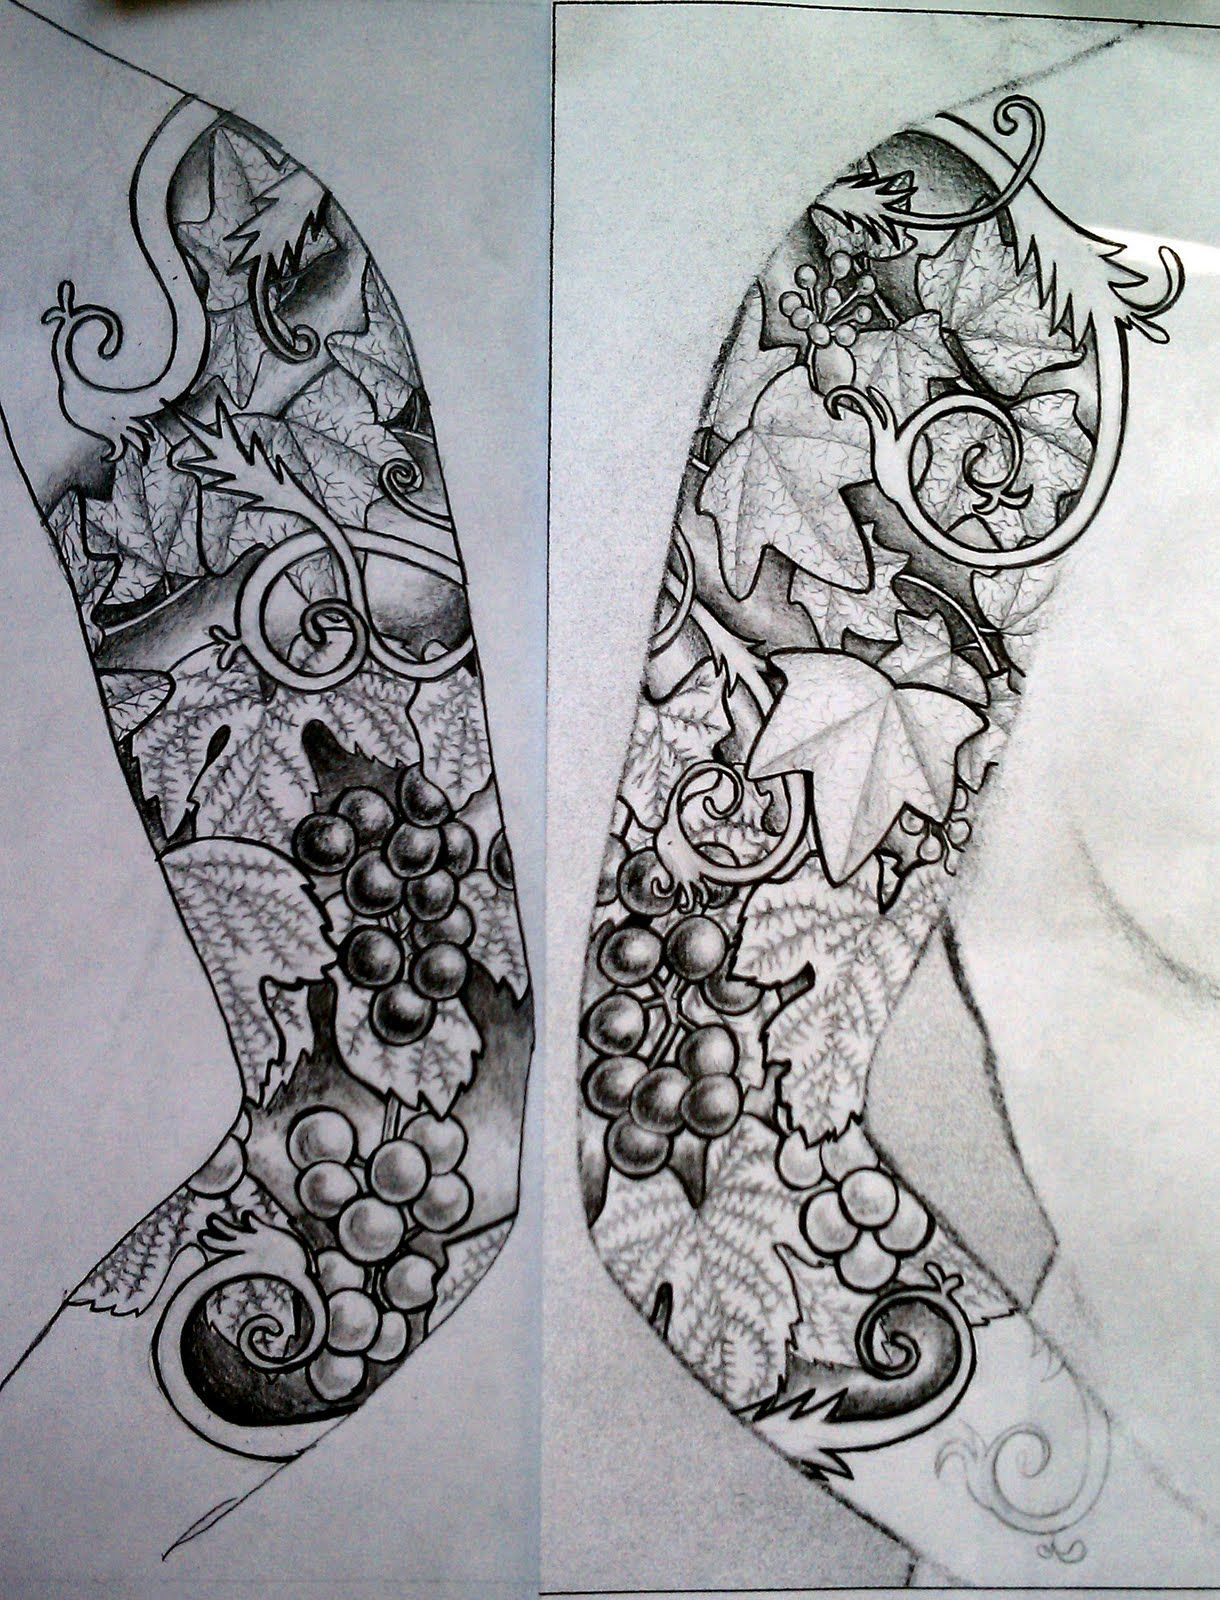 Microcosm Leaf Sleeve Tattoo Design Sleeve Tattoos Half Sleeve Tattoos Designs Half Sleeve Tattoos Drawings